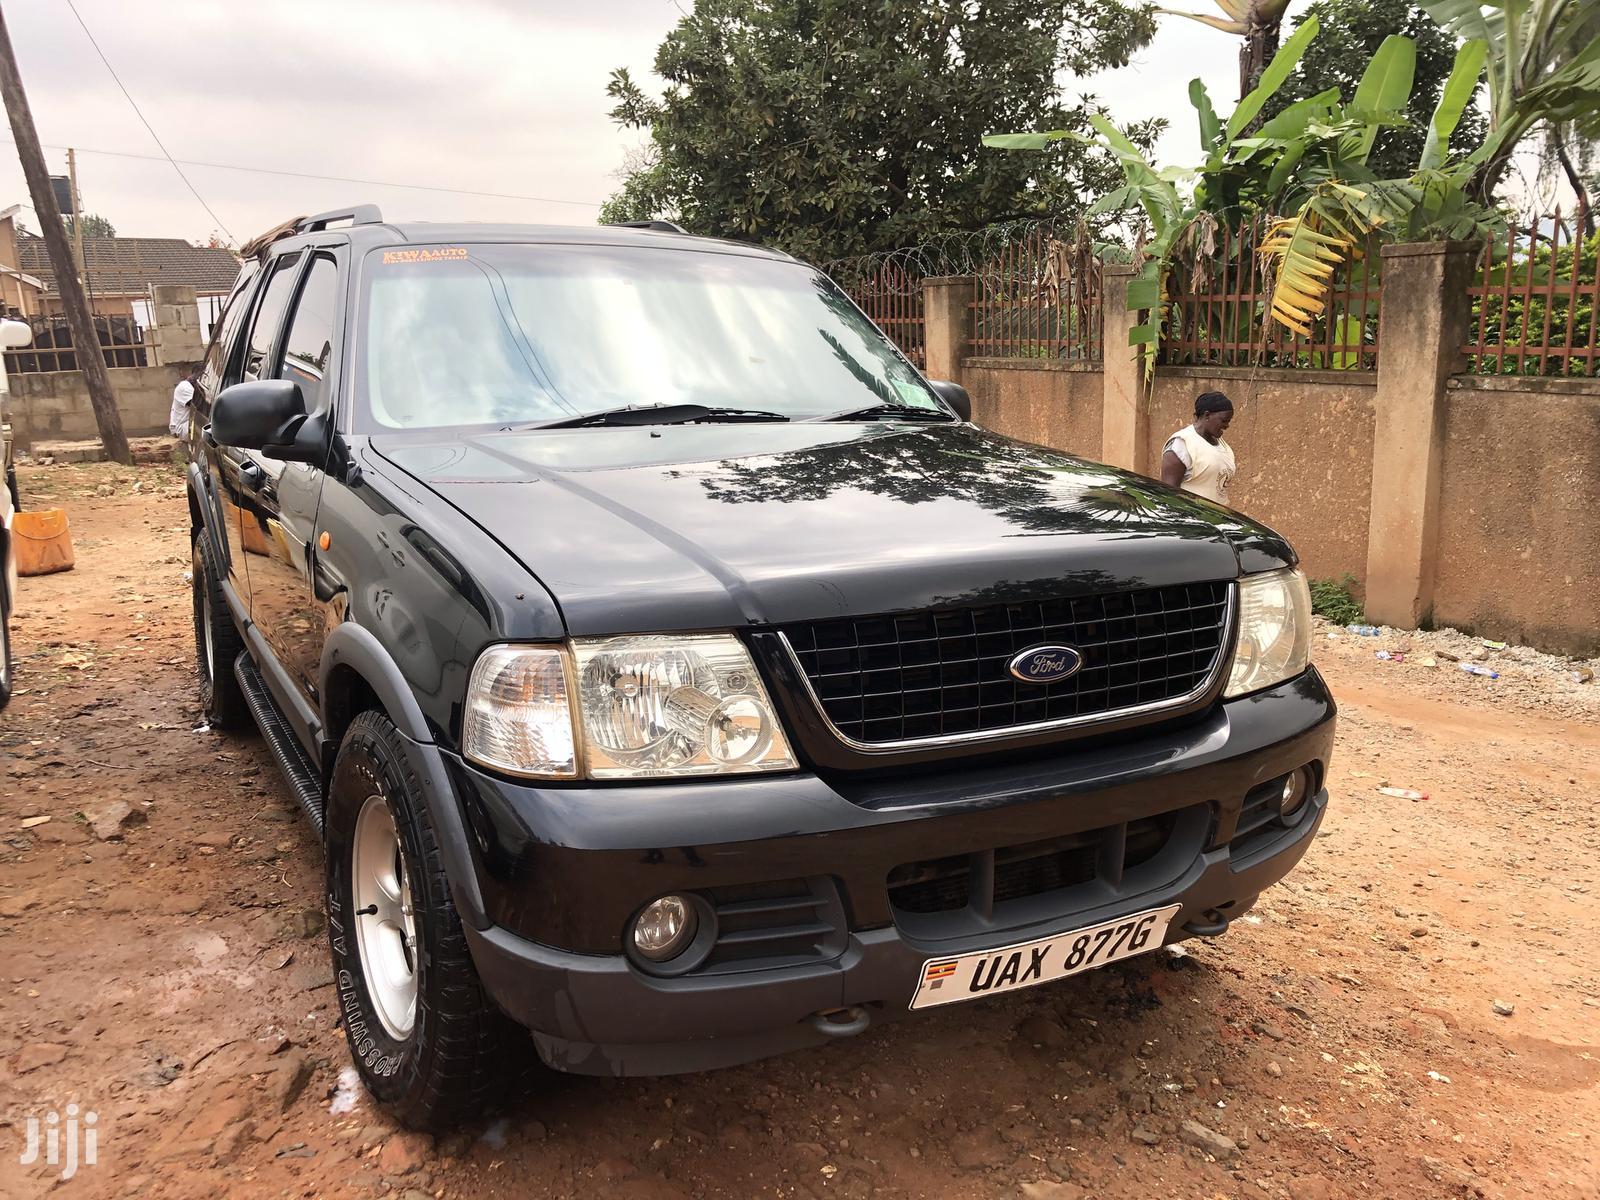 Ford Explorer 2004 Black In Kampala Cars Akram Banyikidde Jiji Ug For Sale In Kampala Buy Cars From Akram Banyikidde On Jiji Ug